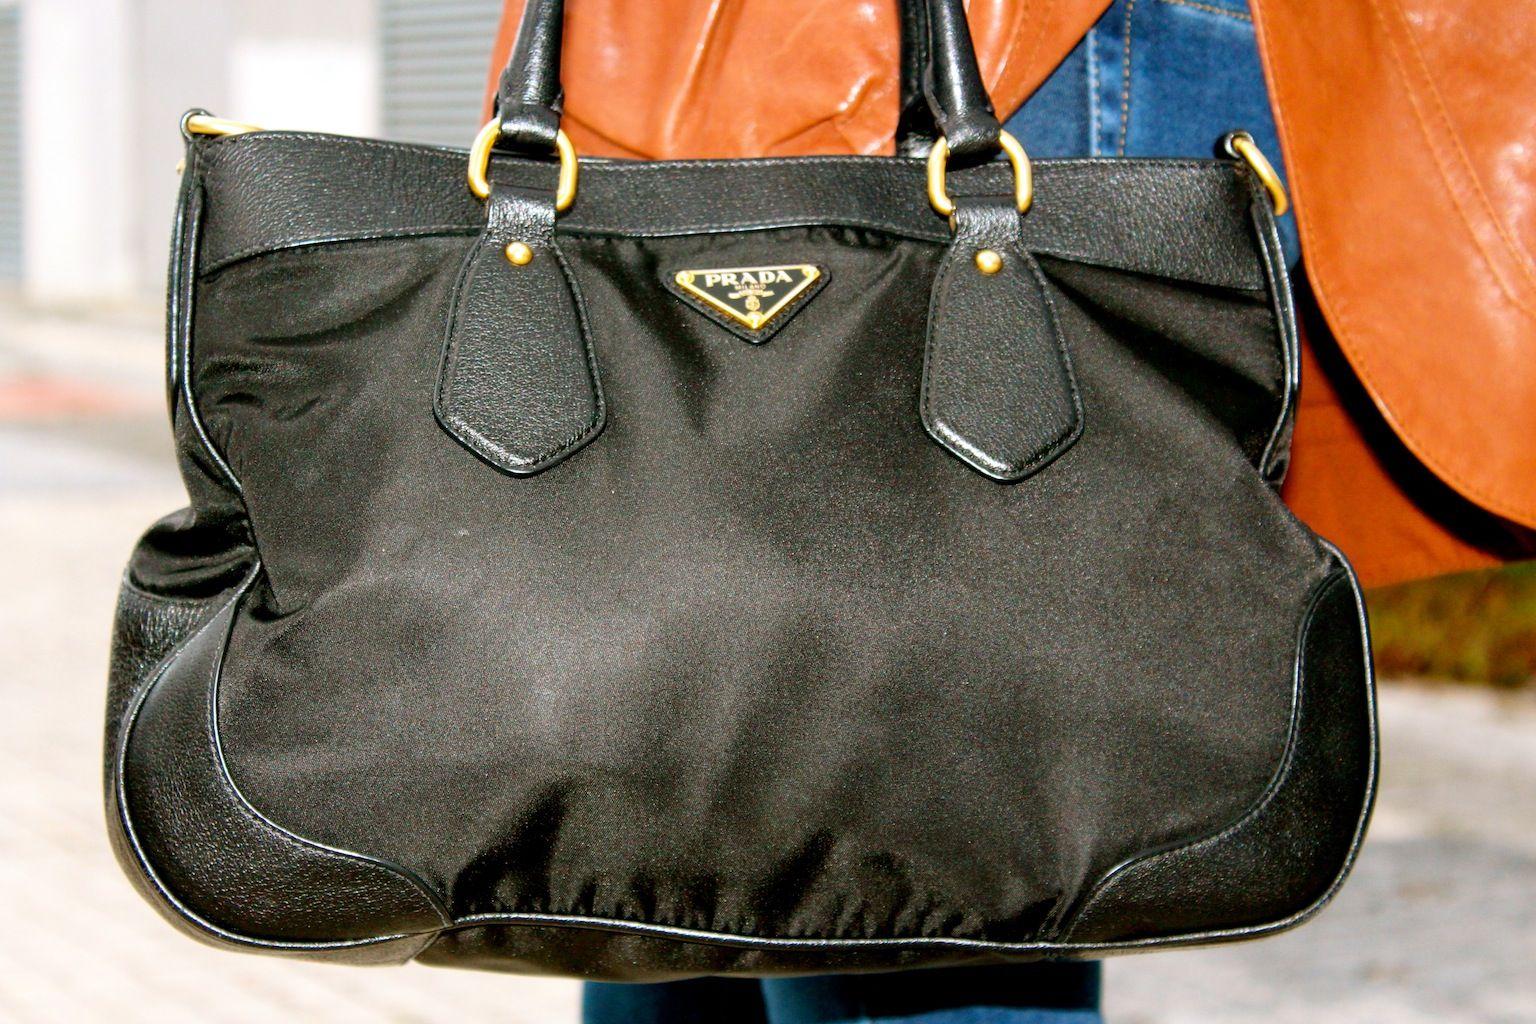 Fashion and Style Blog / Blog de Moda . Post: Little treasures / Pequeños tesoros .More pictures on/ Más fotos en : http://www.ohmylooks.com/?p=20999 I wear Jacket : Hoss Intropia (old) ; Jeans : Zara ; Bag : Prada ; Sunglasses : Mango ; Shoes : Pilar Burgos.